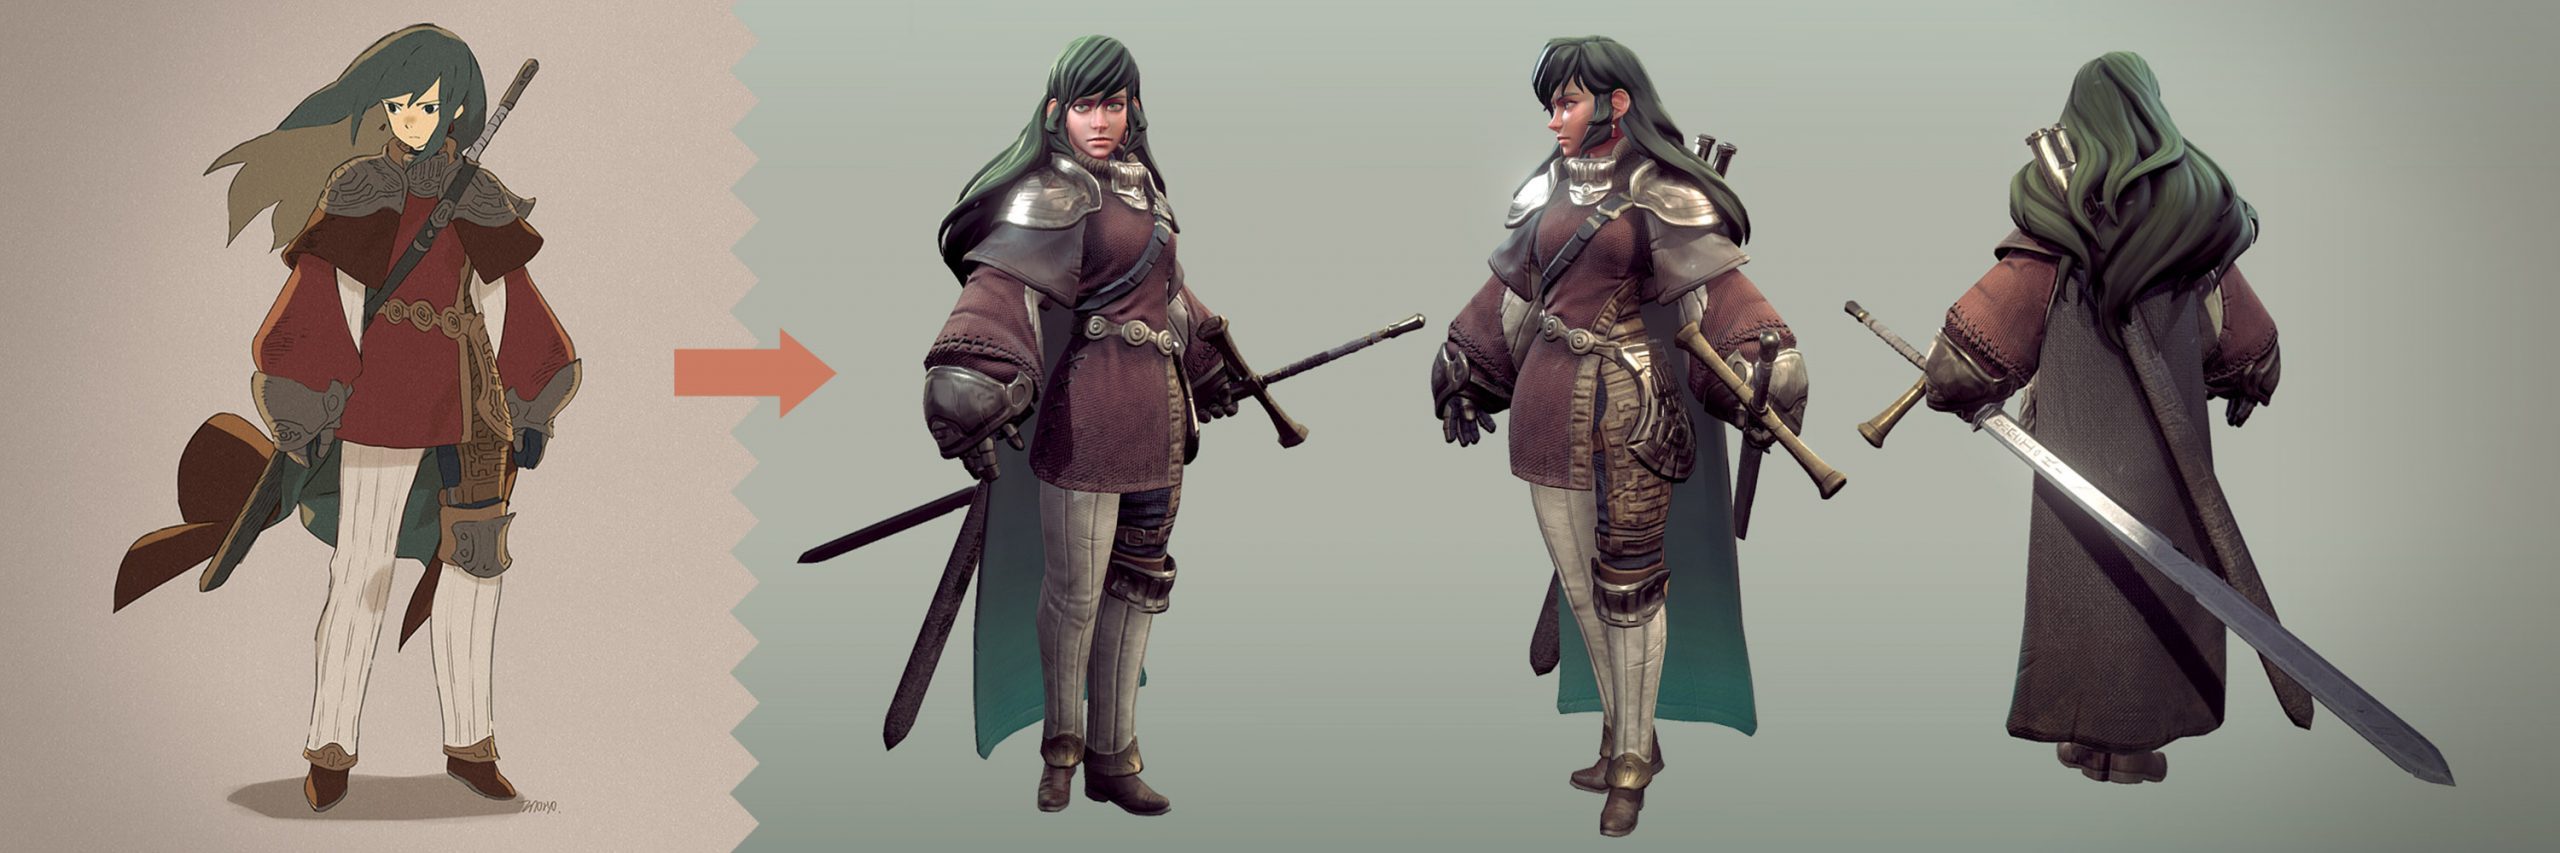 knight of orimo header